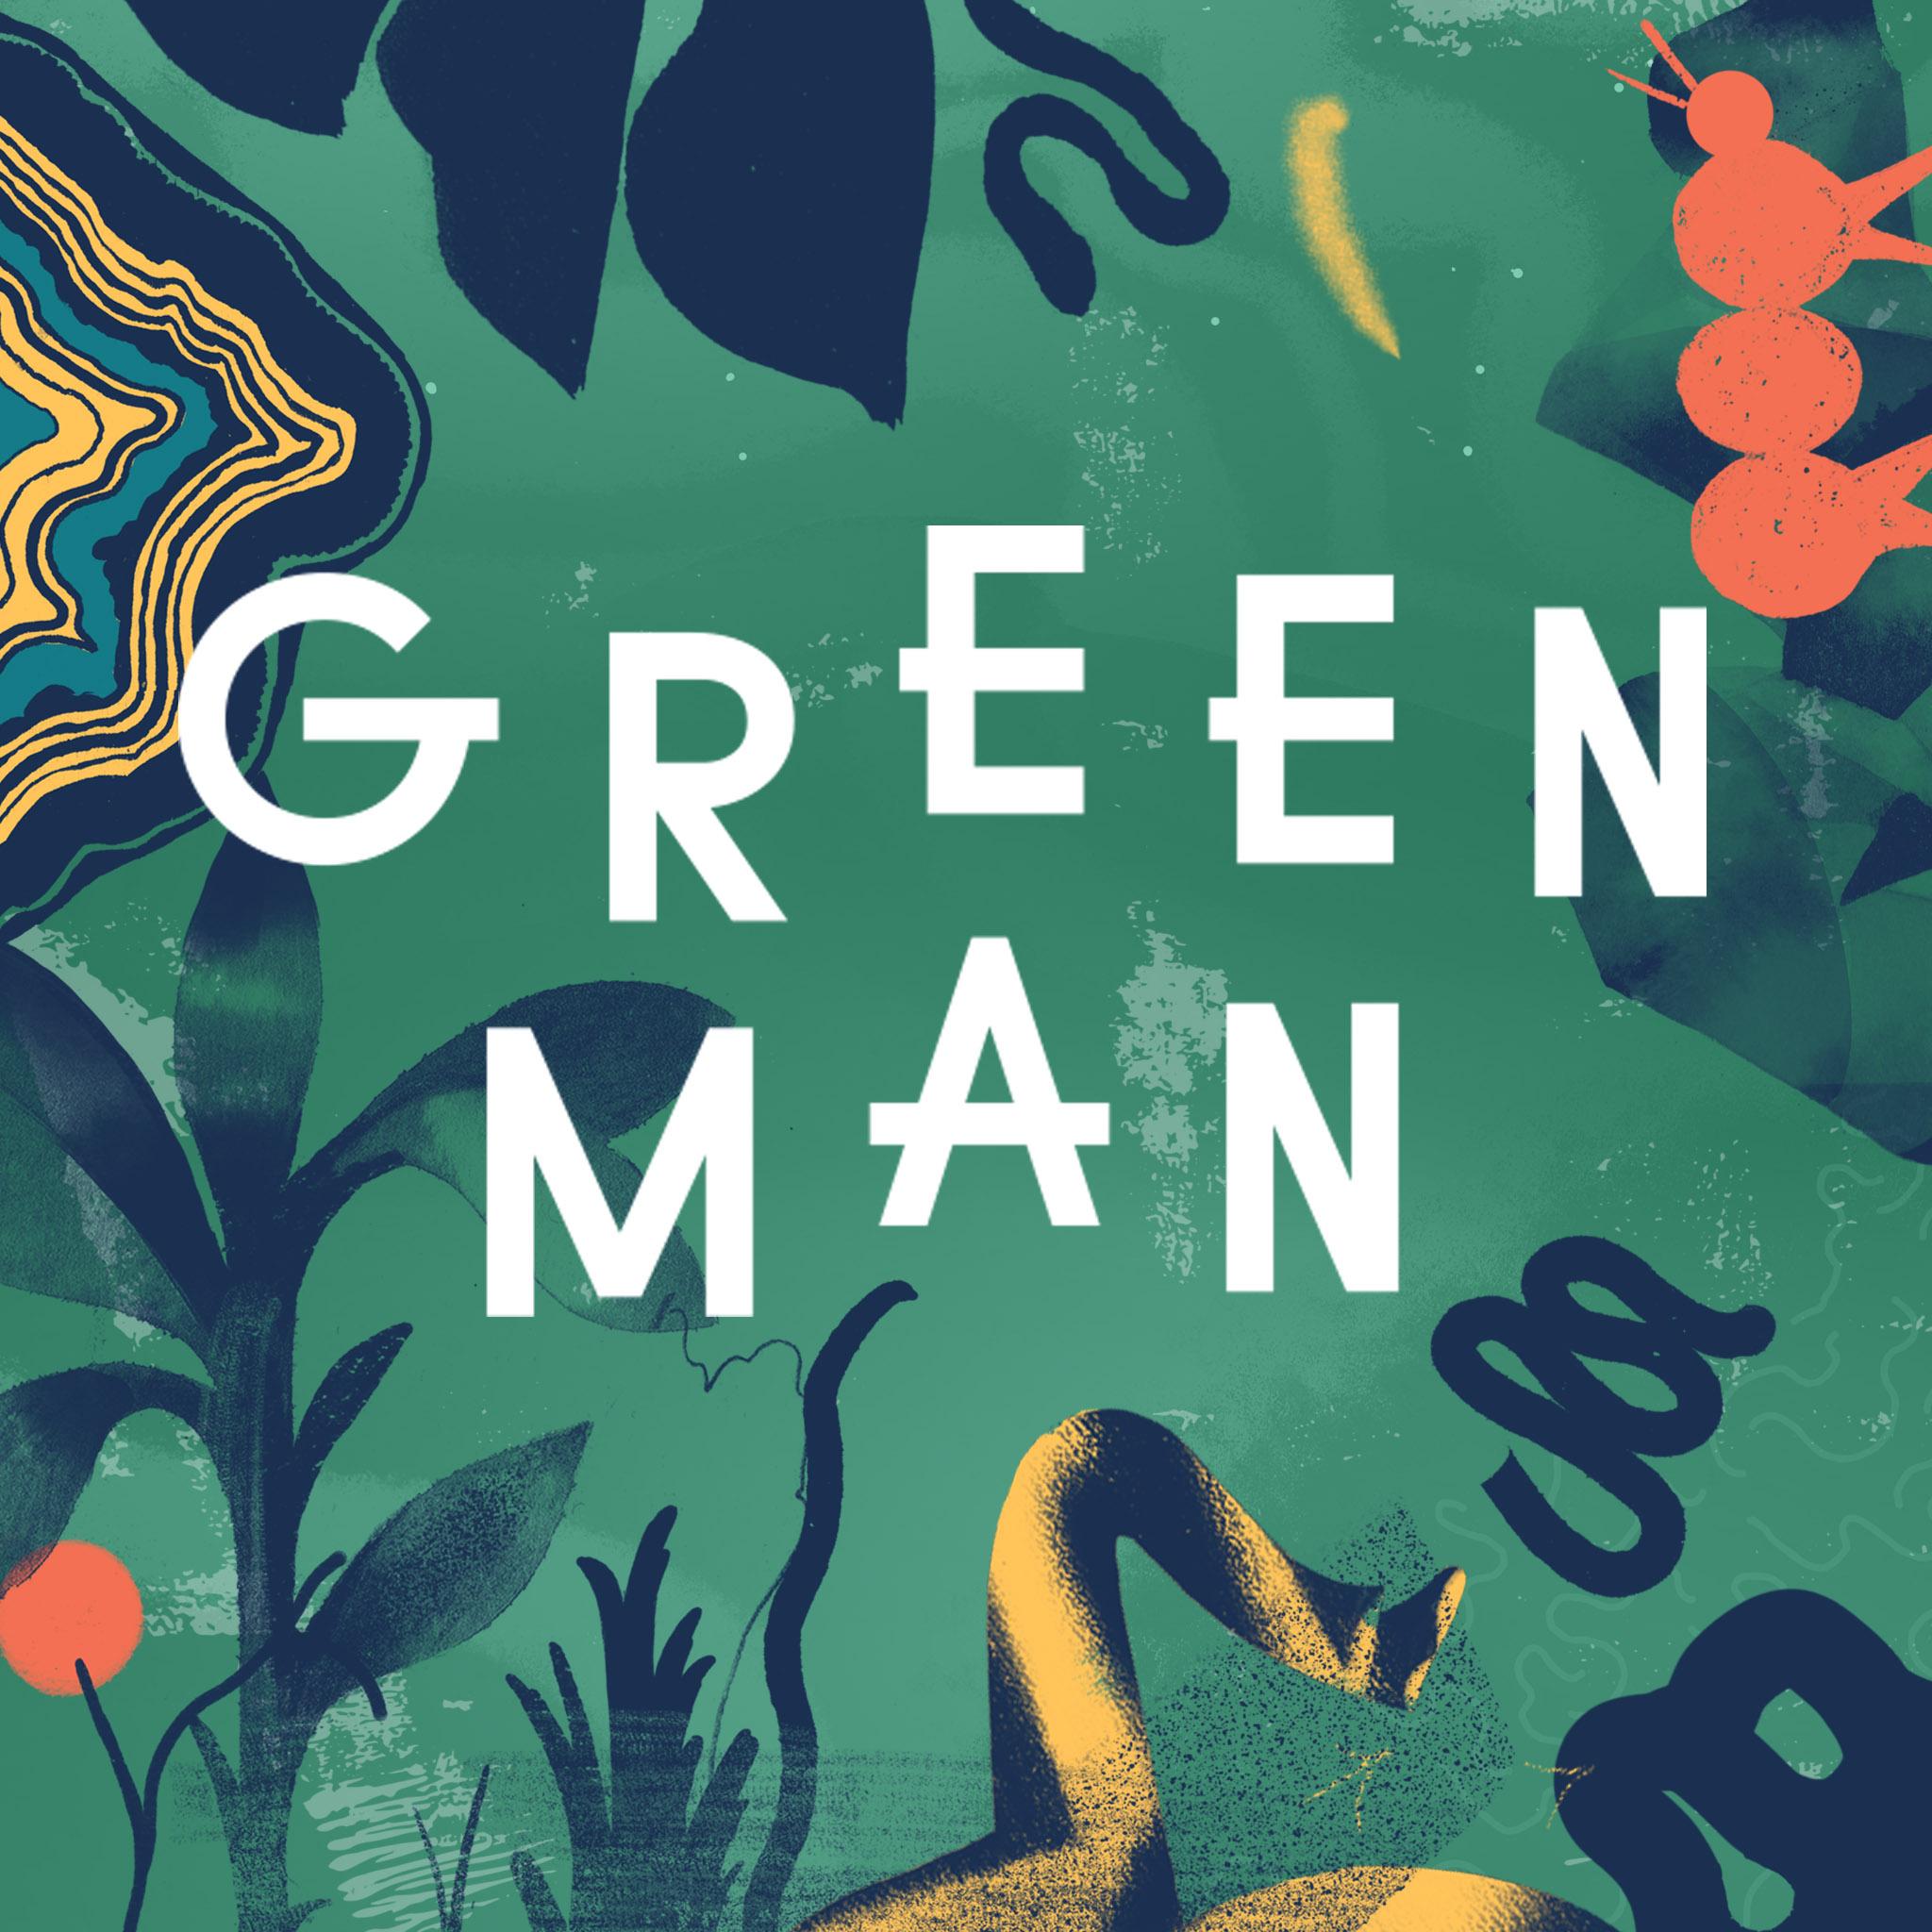 Green Man 2021 Festival - 5 Month Payment Plan